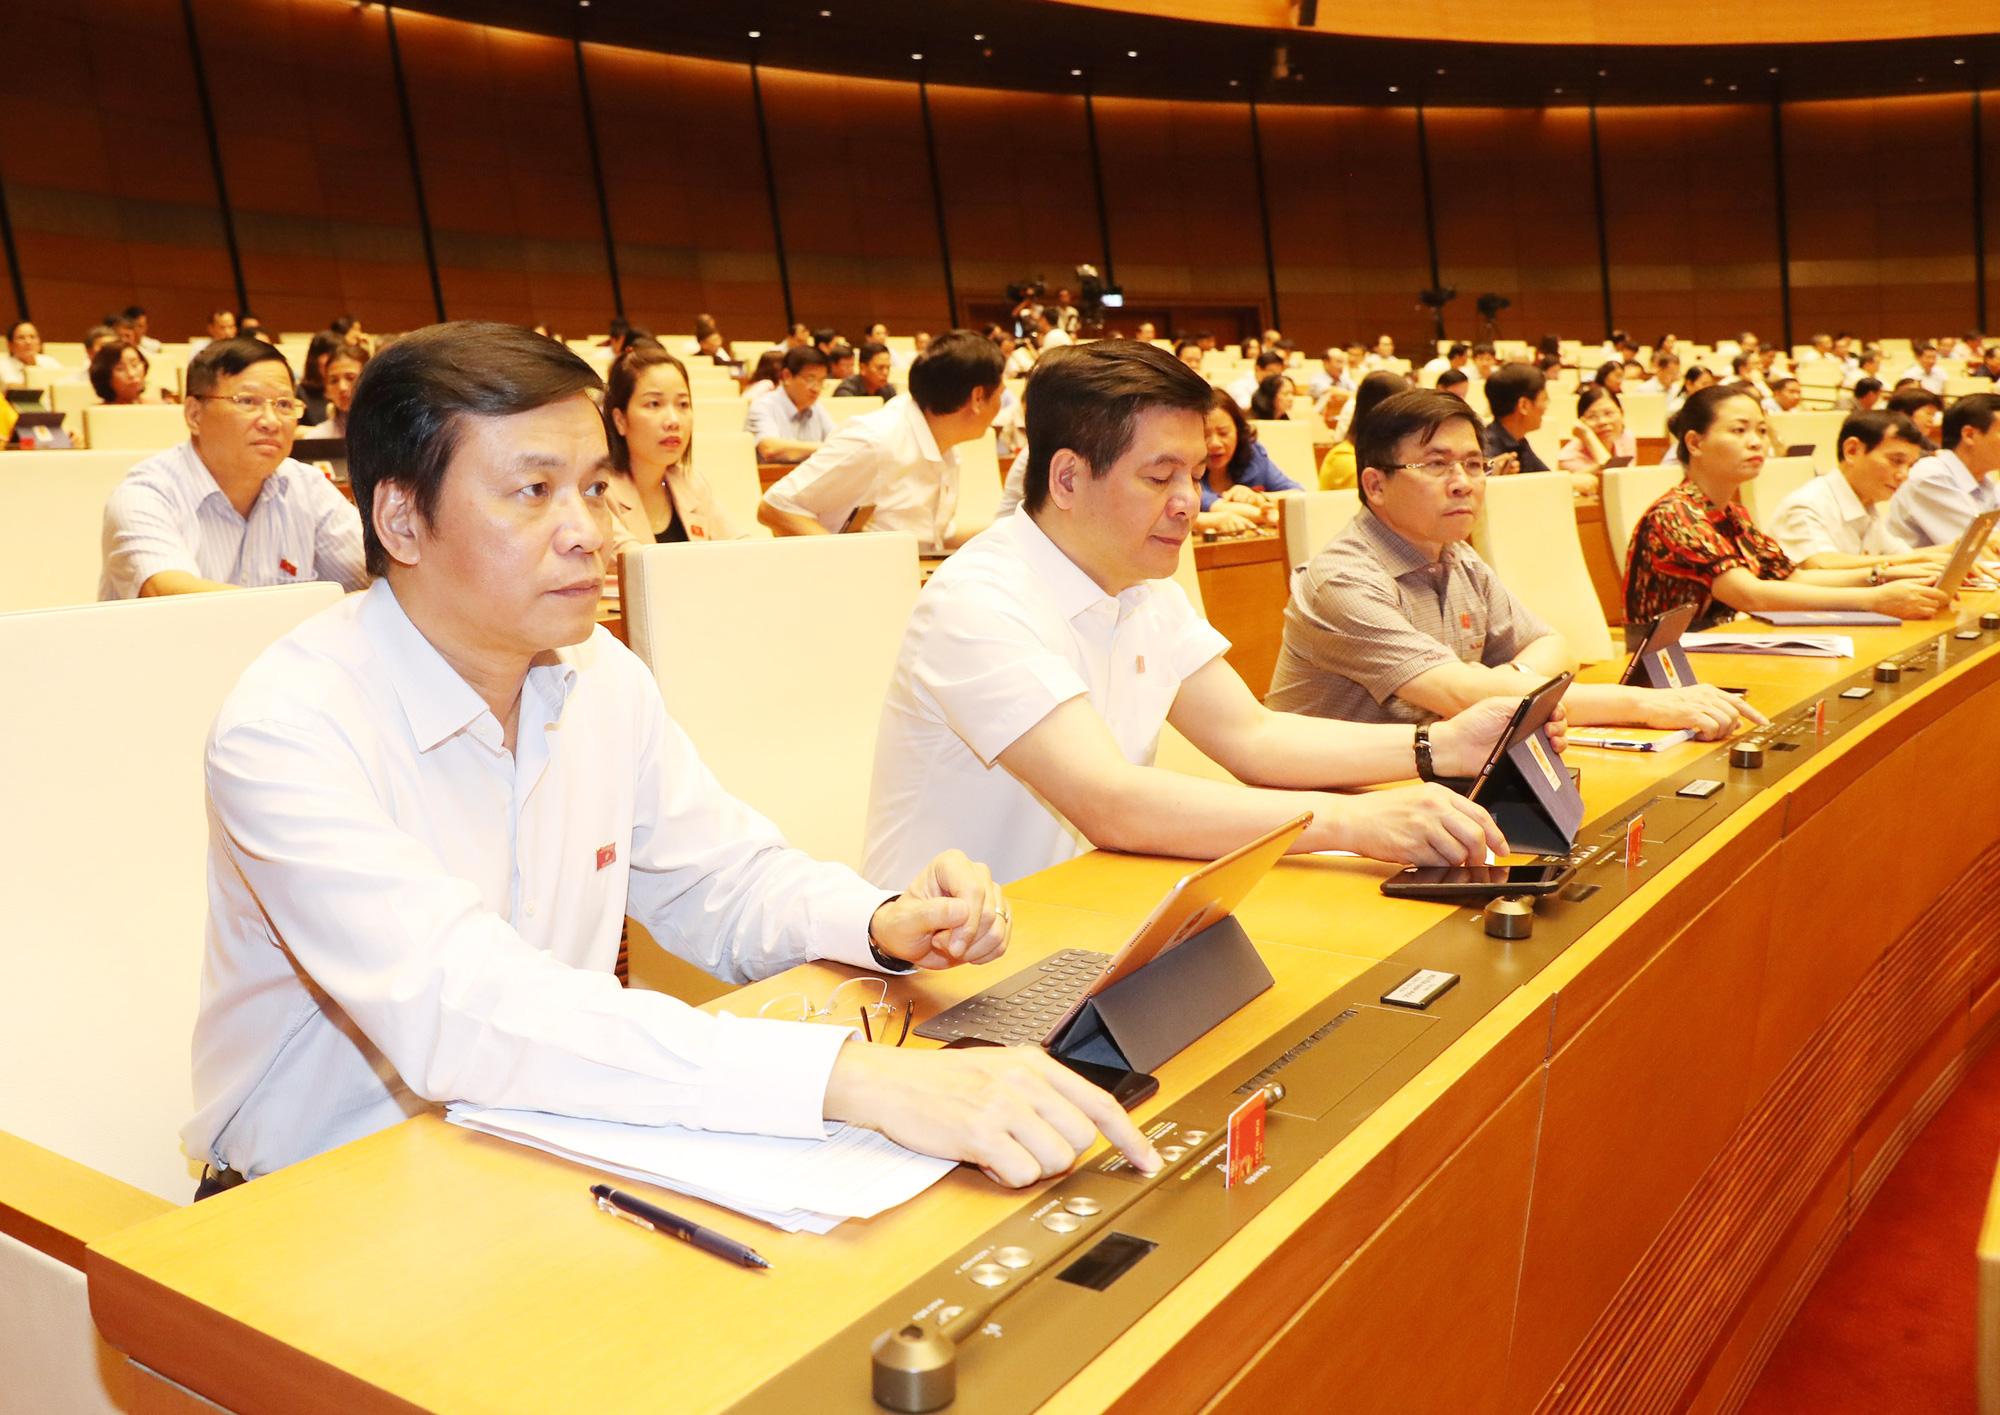 Vietnamese legislature ratifies 30% corporate income tax cut in 2020 for SMEs